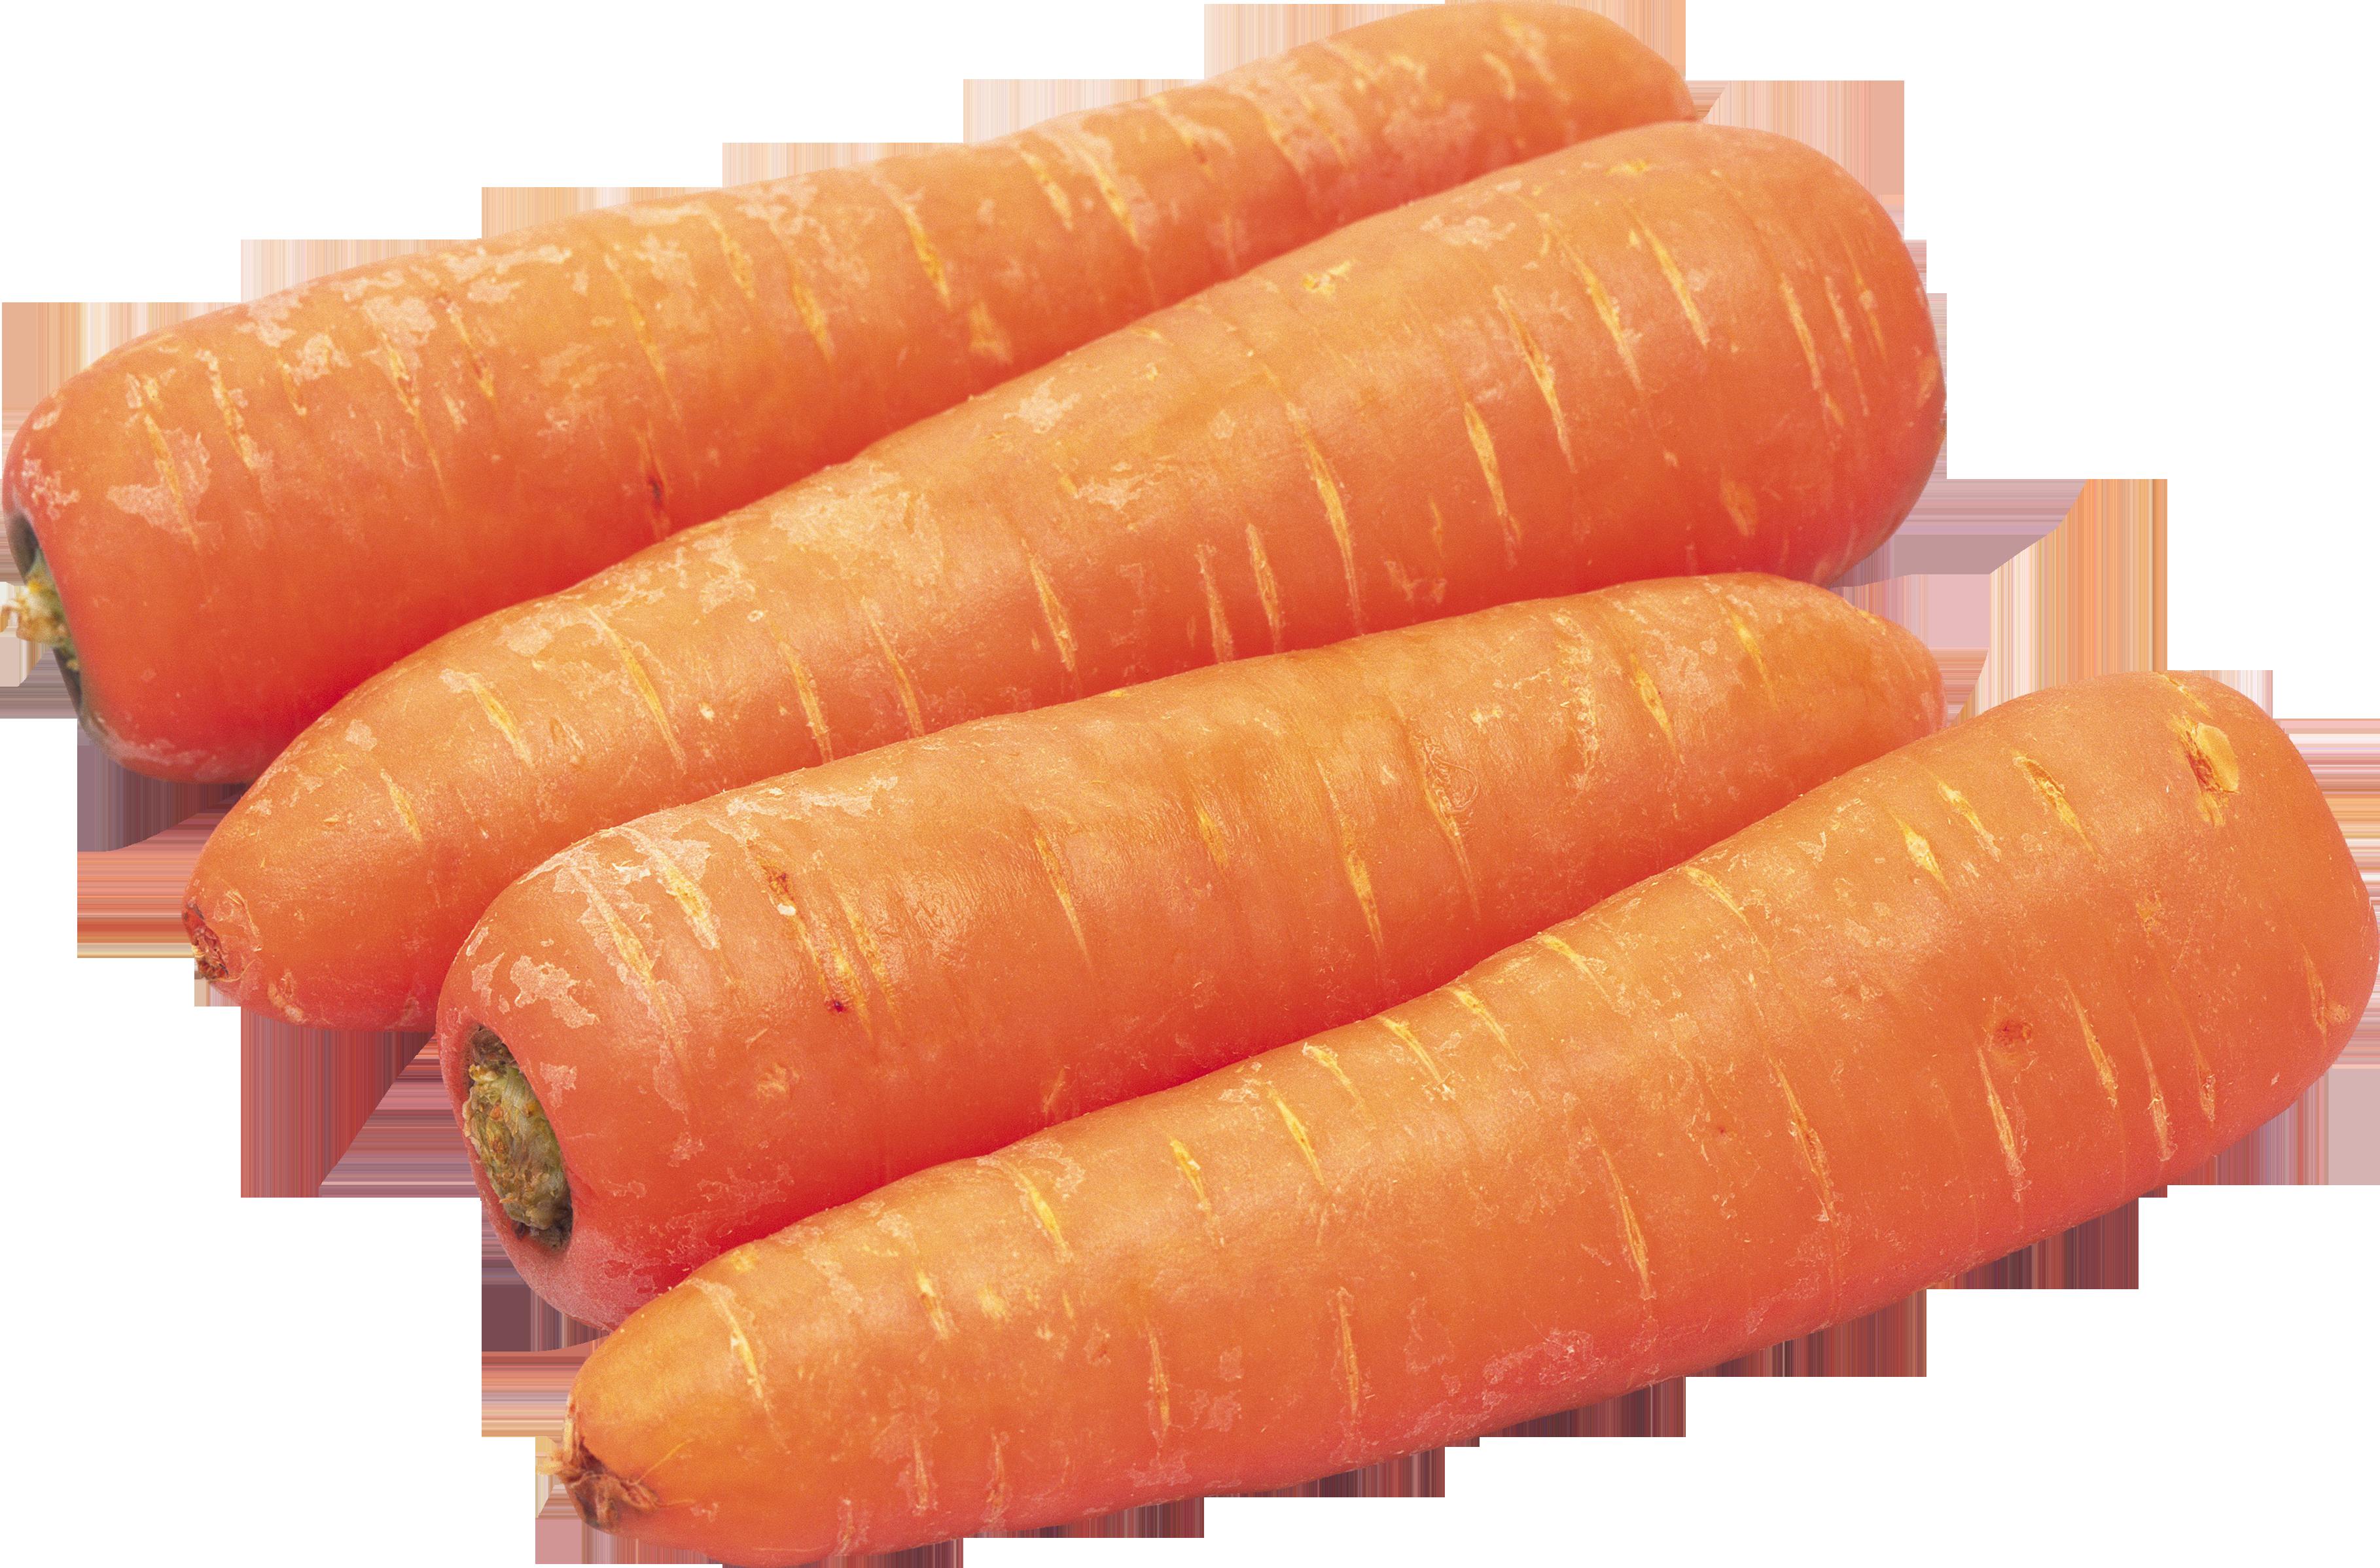 справочнику корнеплода моркови картинки имеют привилегию проклинать